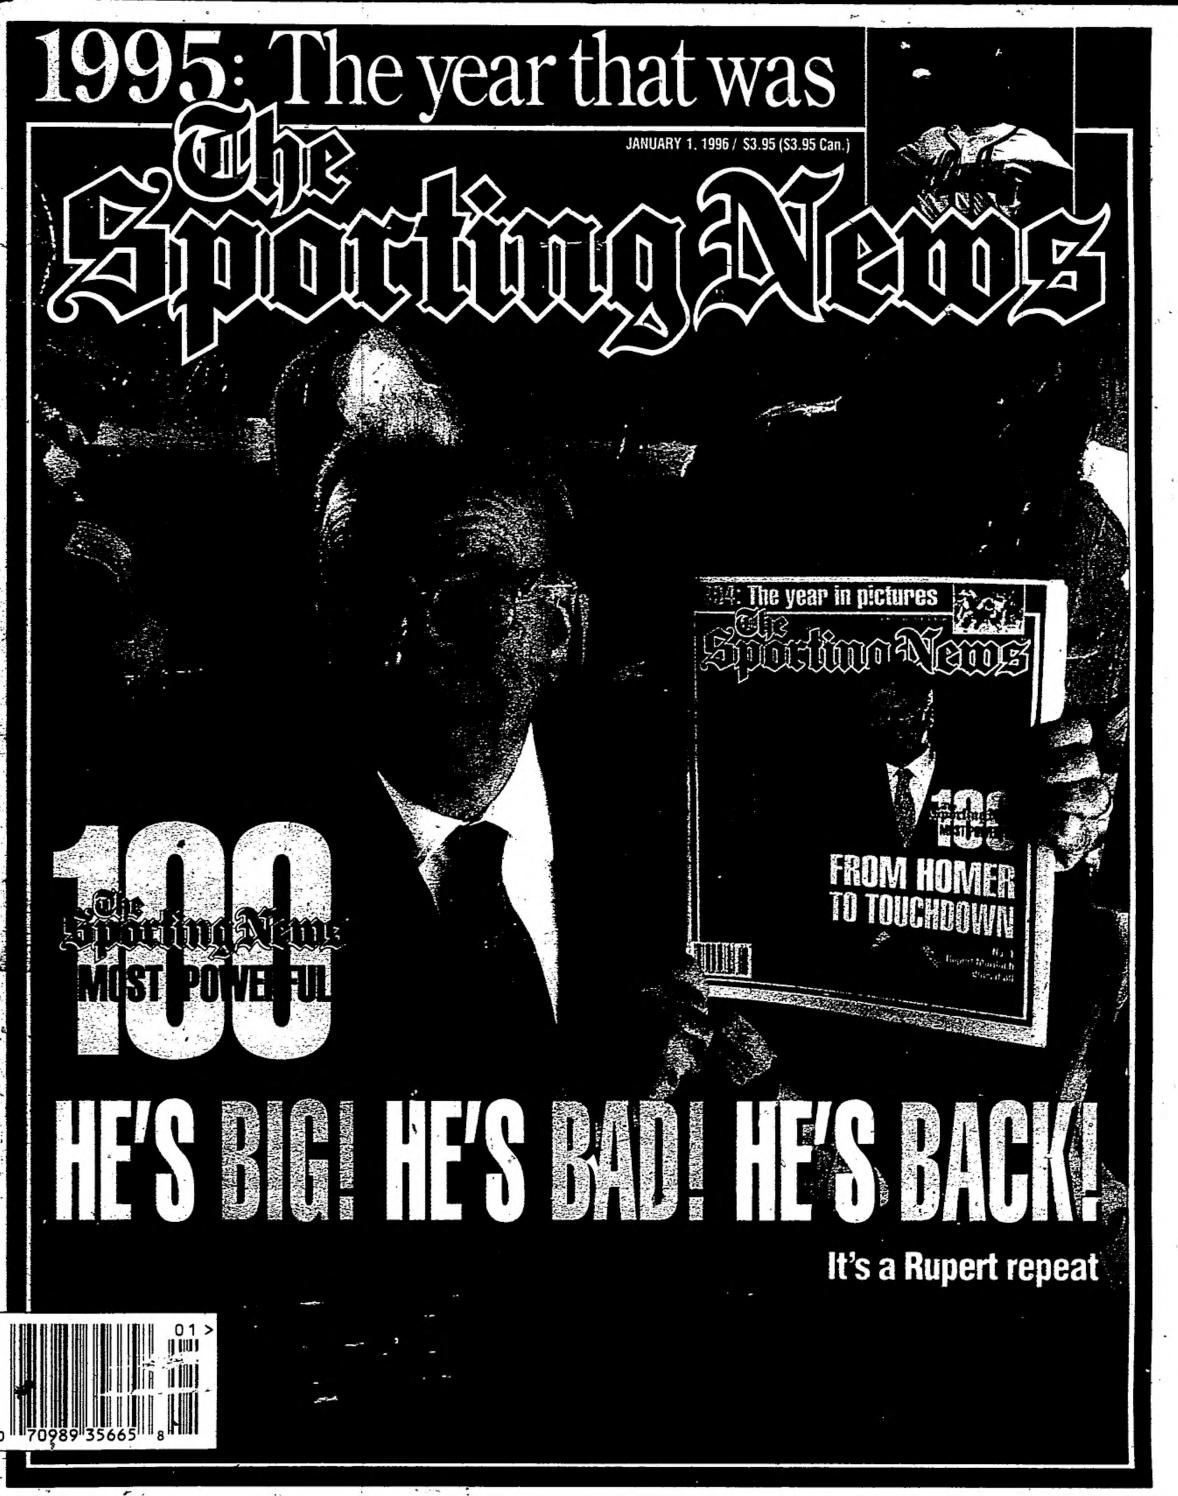 KENT HARRINGTON VERY FINE 1ST EDITION 1996 DARK RIDE PRICE REDUCED !!